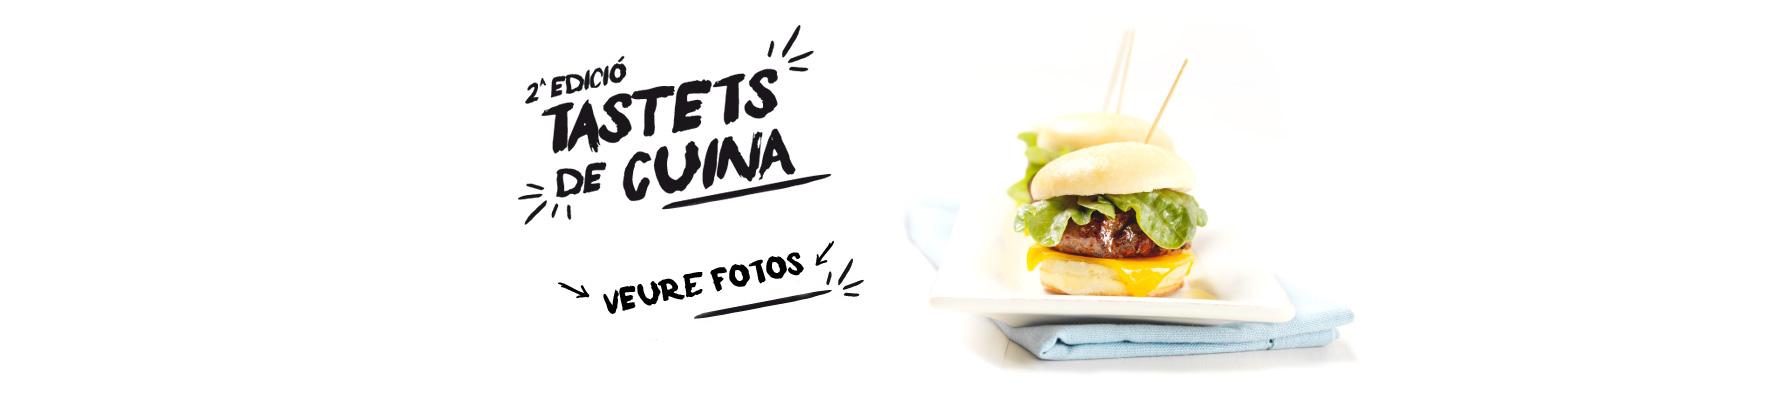 tastets_cuina